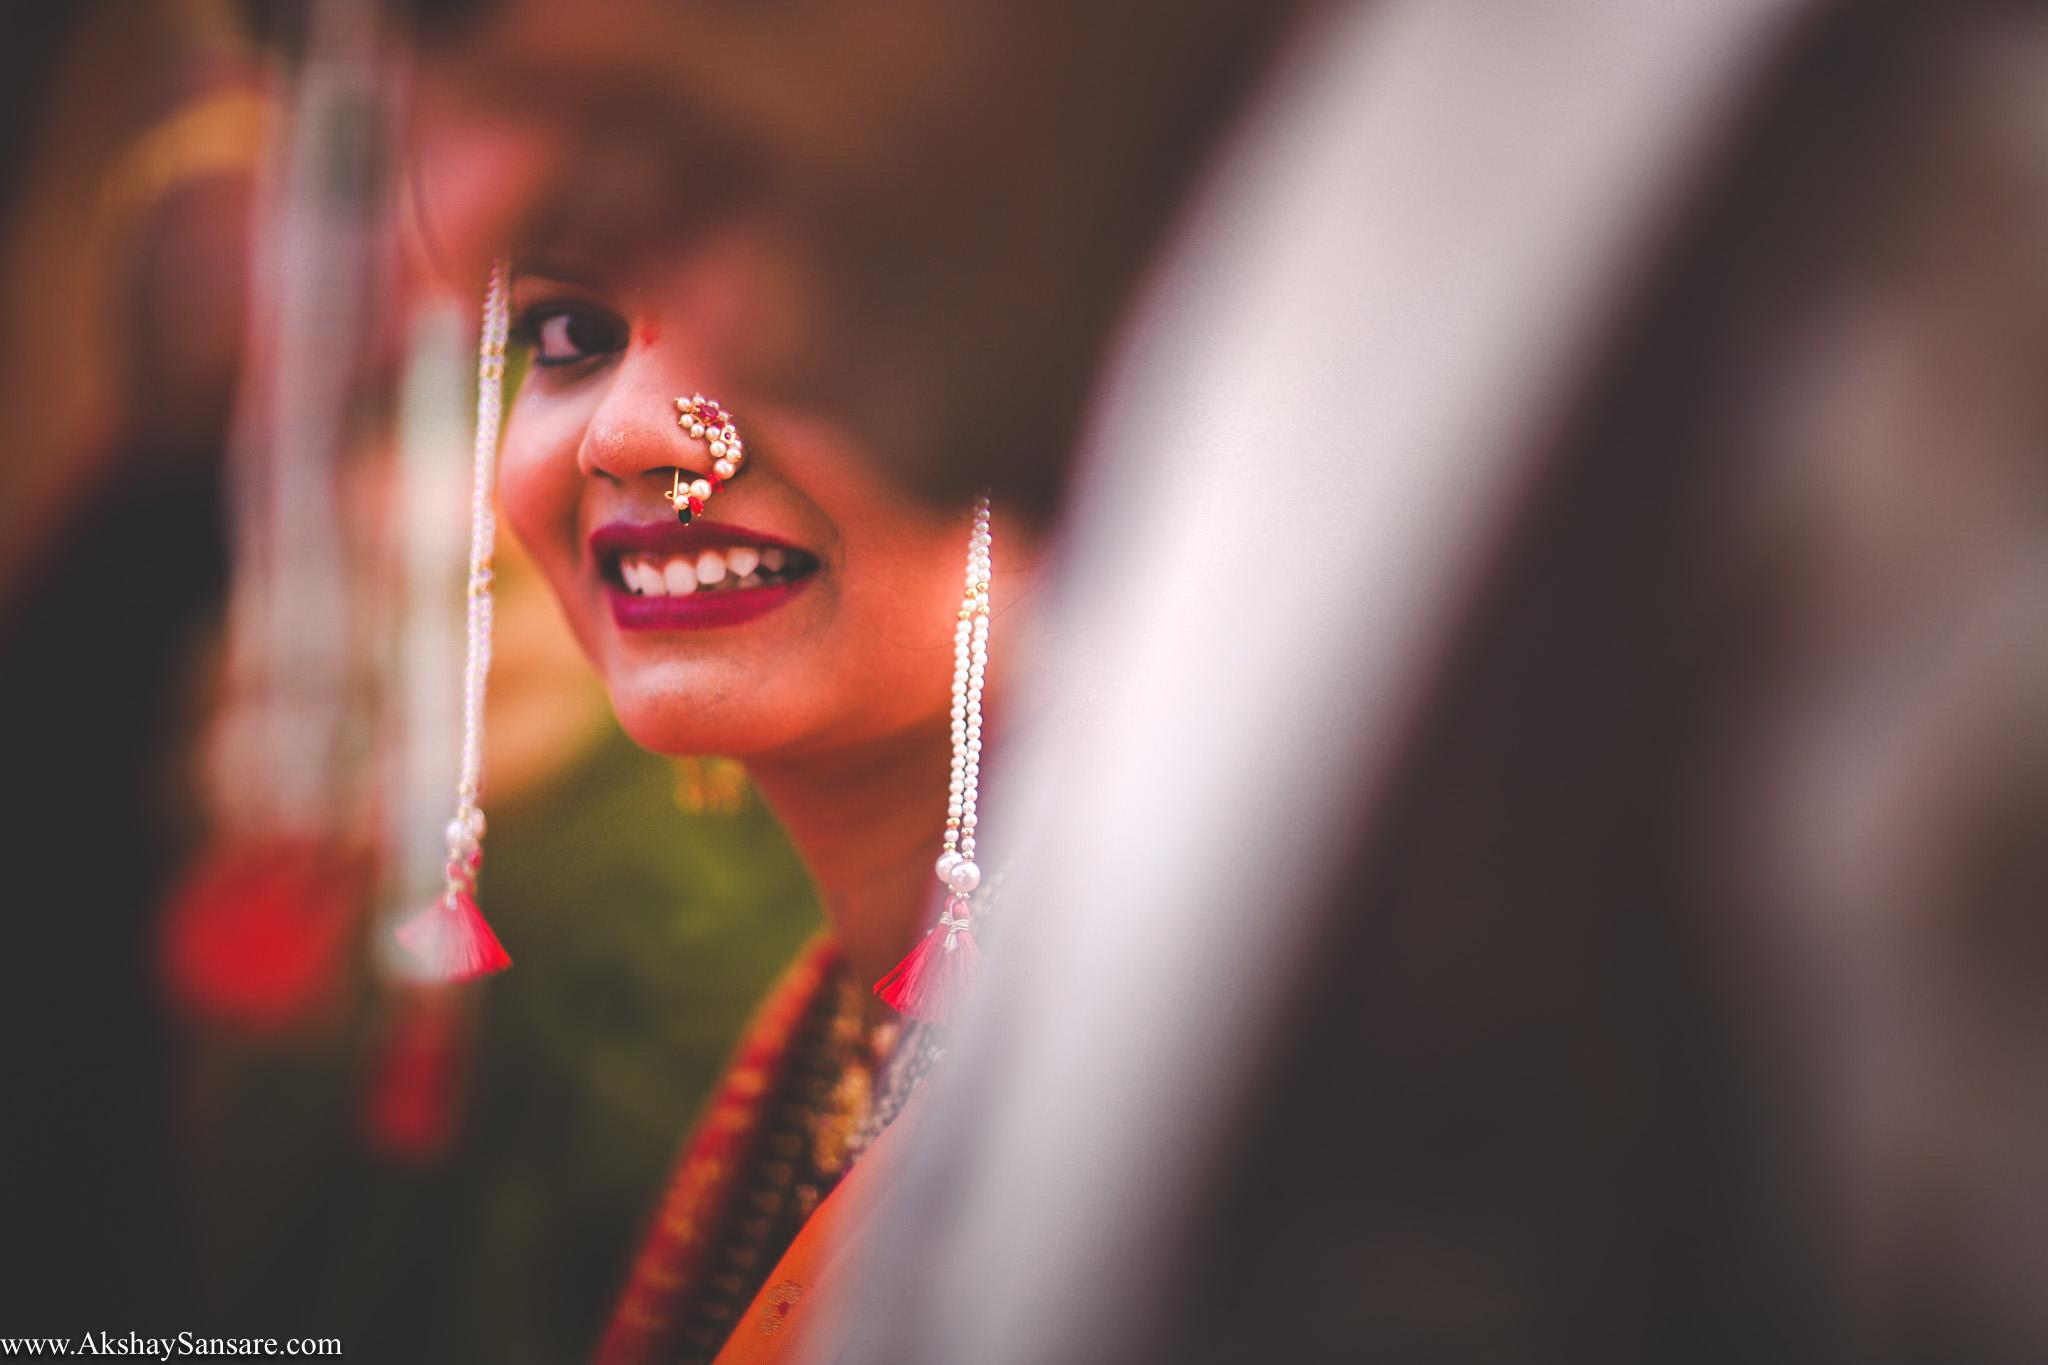 Salil x Kimaya Akshay Sansare Photography Candid wedding Photographer in mumbai best(29).jpg